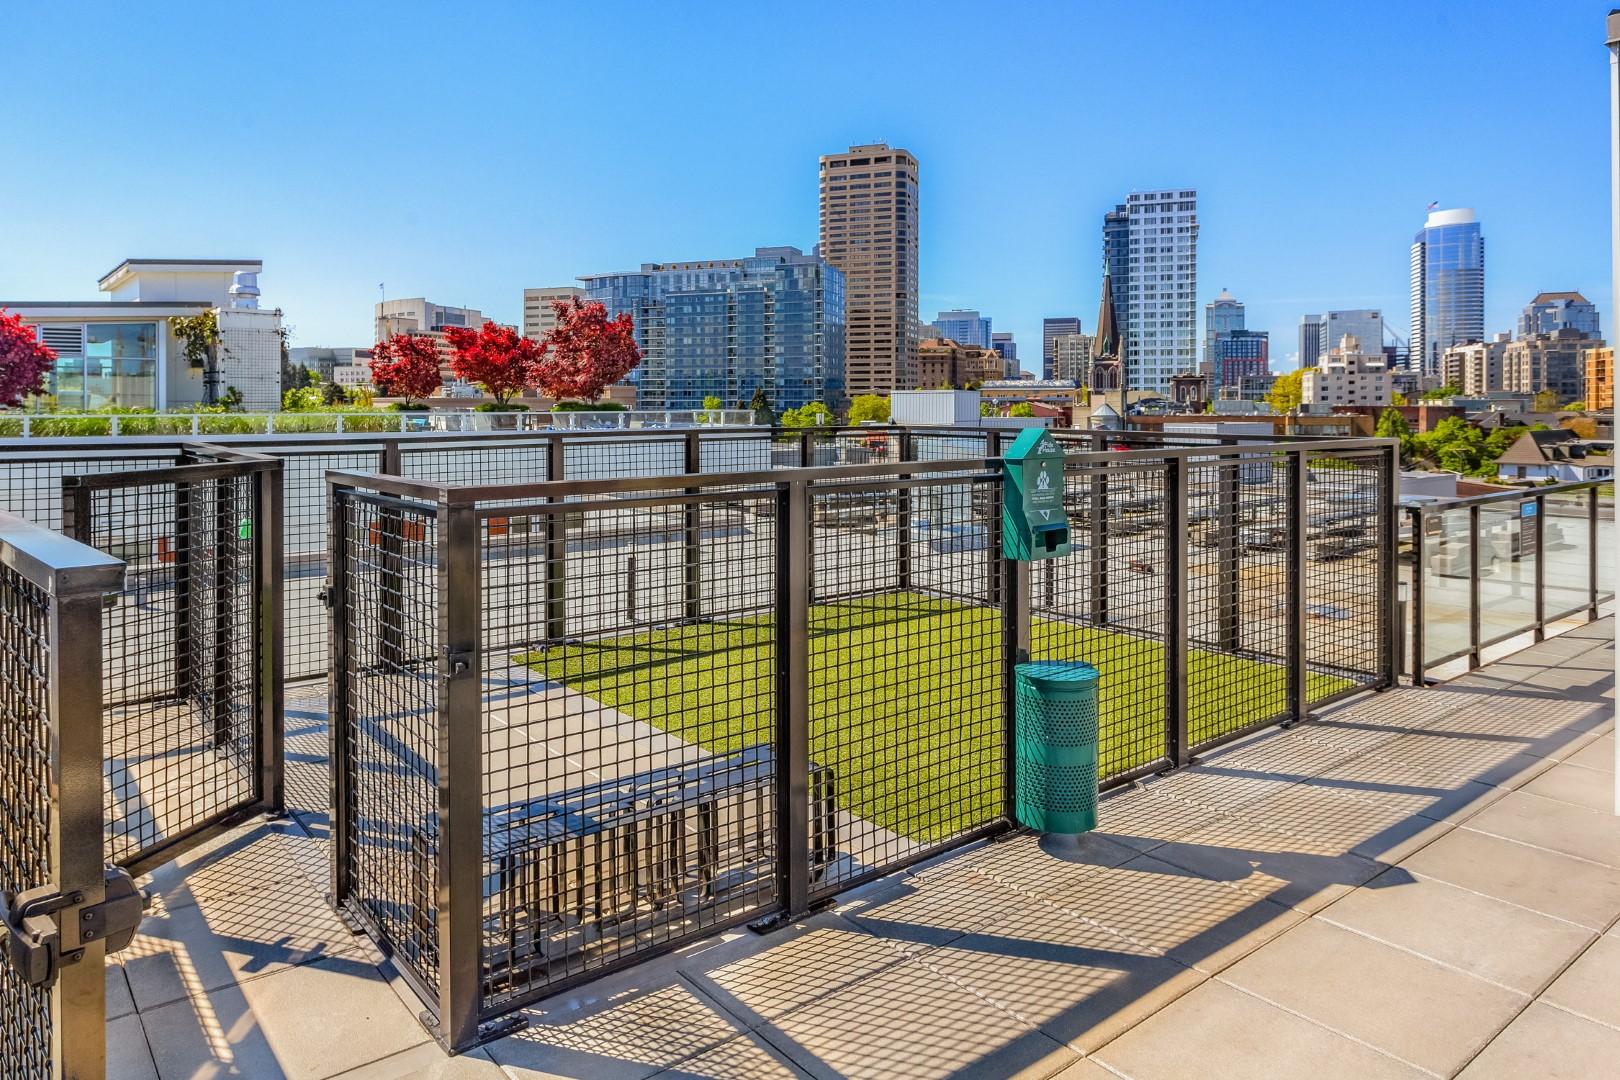 Rooftop Dog Park